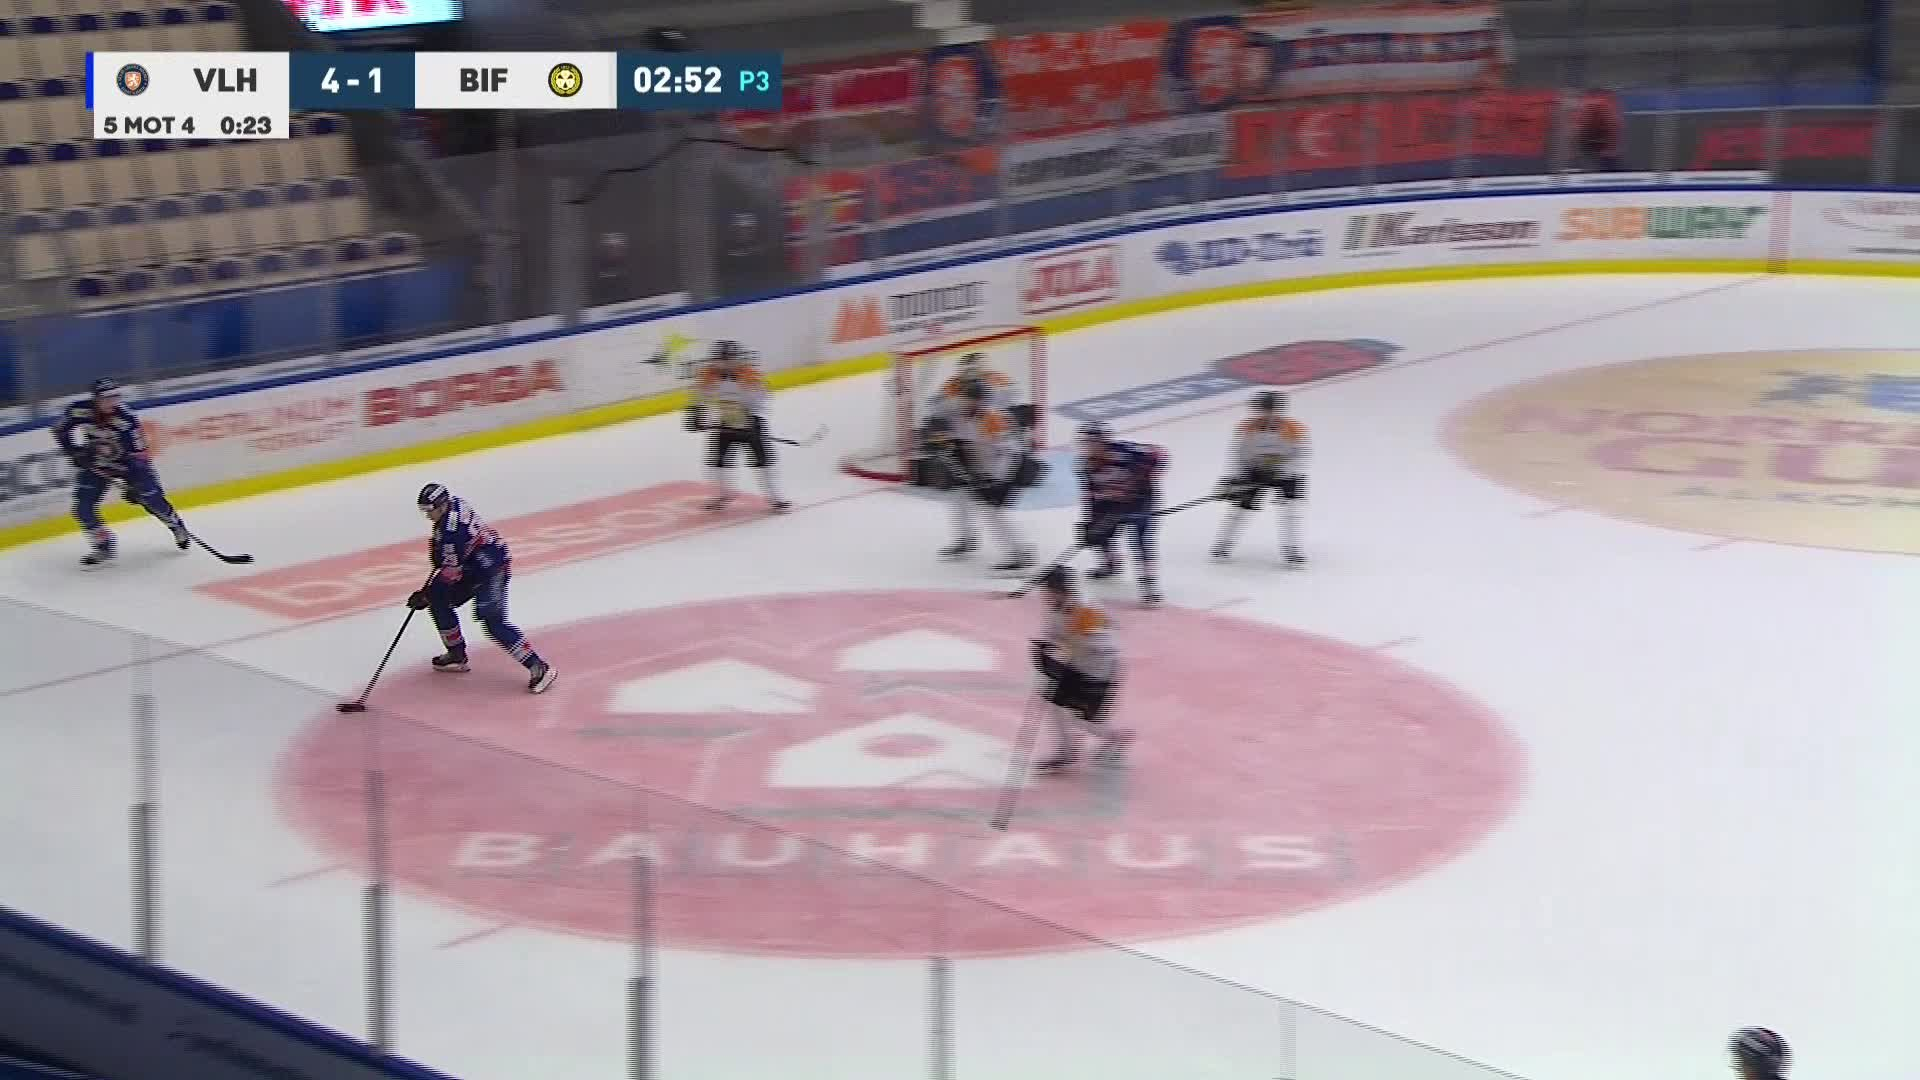 Växjö Lakers - Brynäs IF 5-1